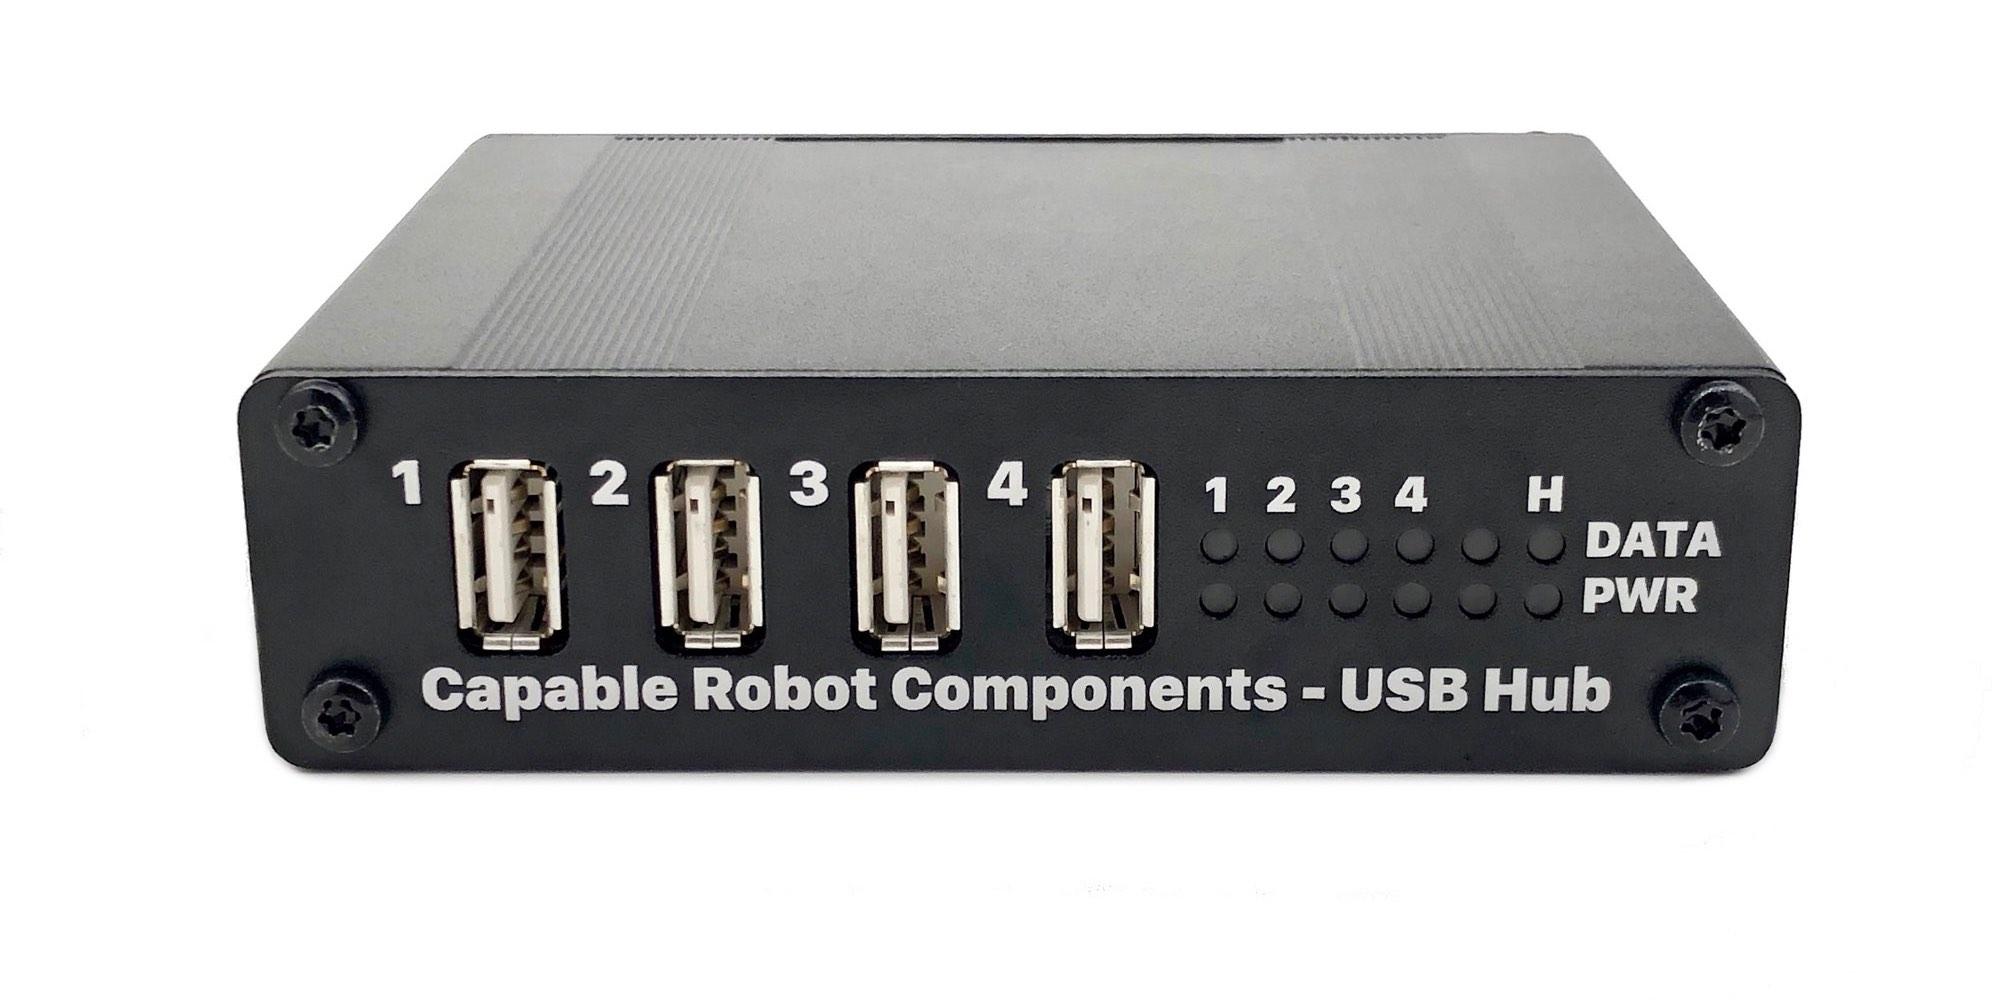 USB Hub in Case, Front